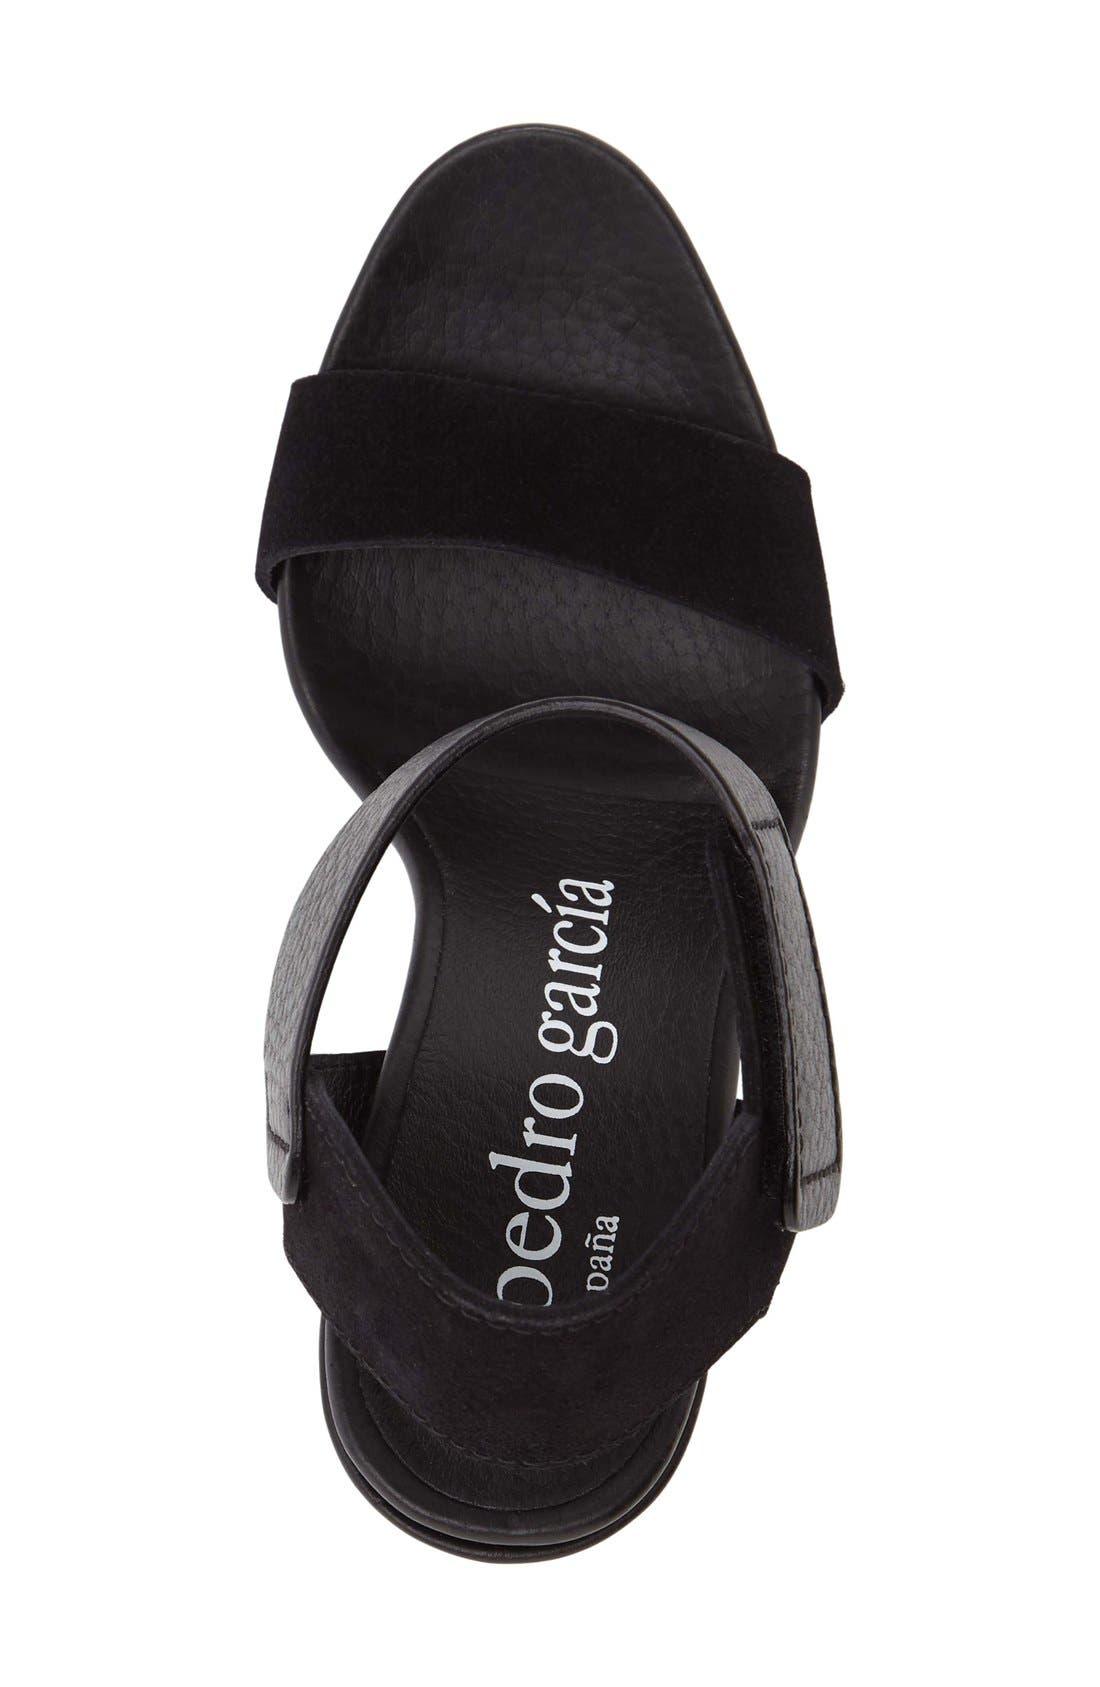 Yola Sandal,                             Alternate thumbnail 3, color,                             Black Leather